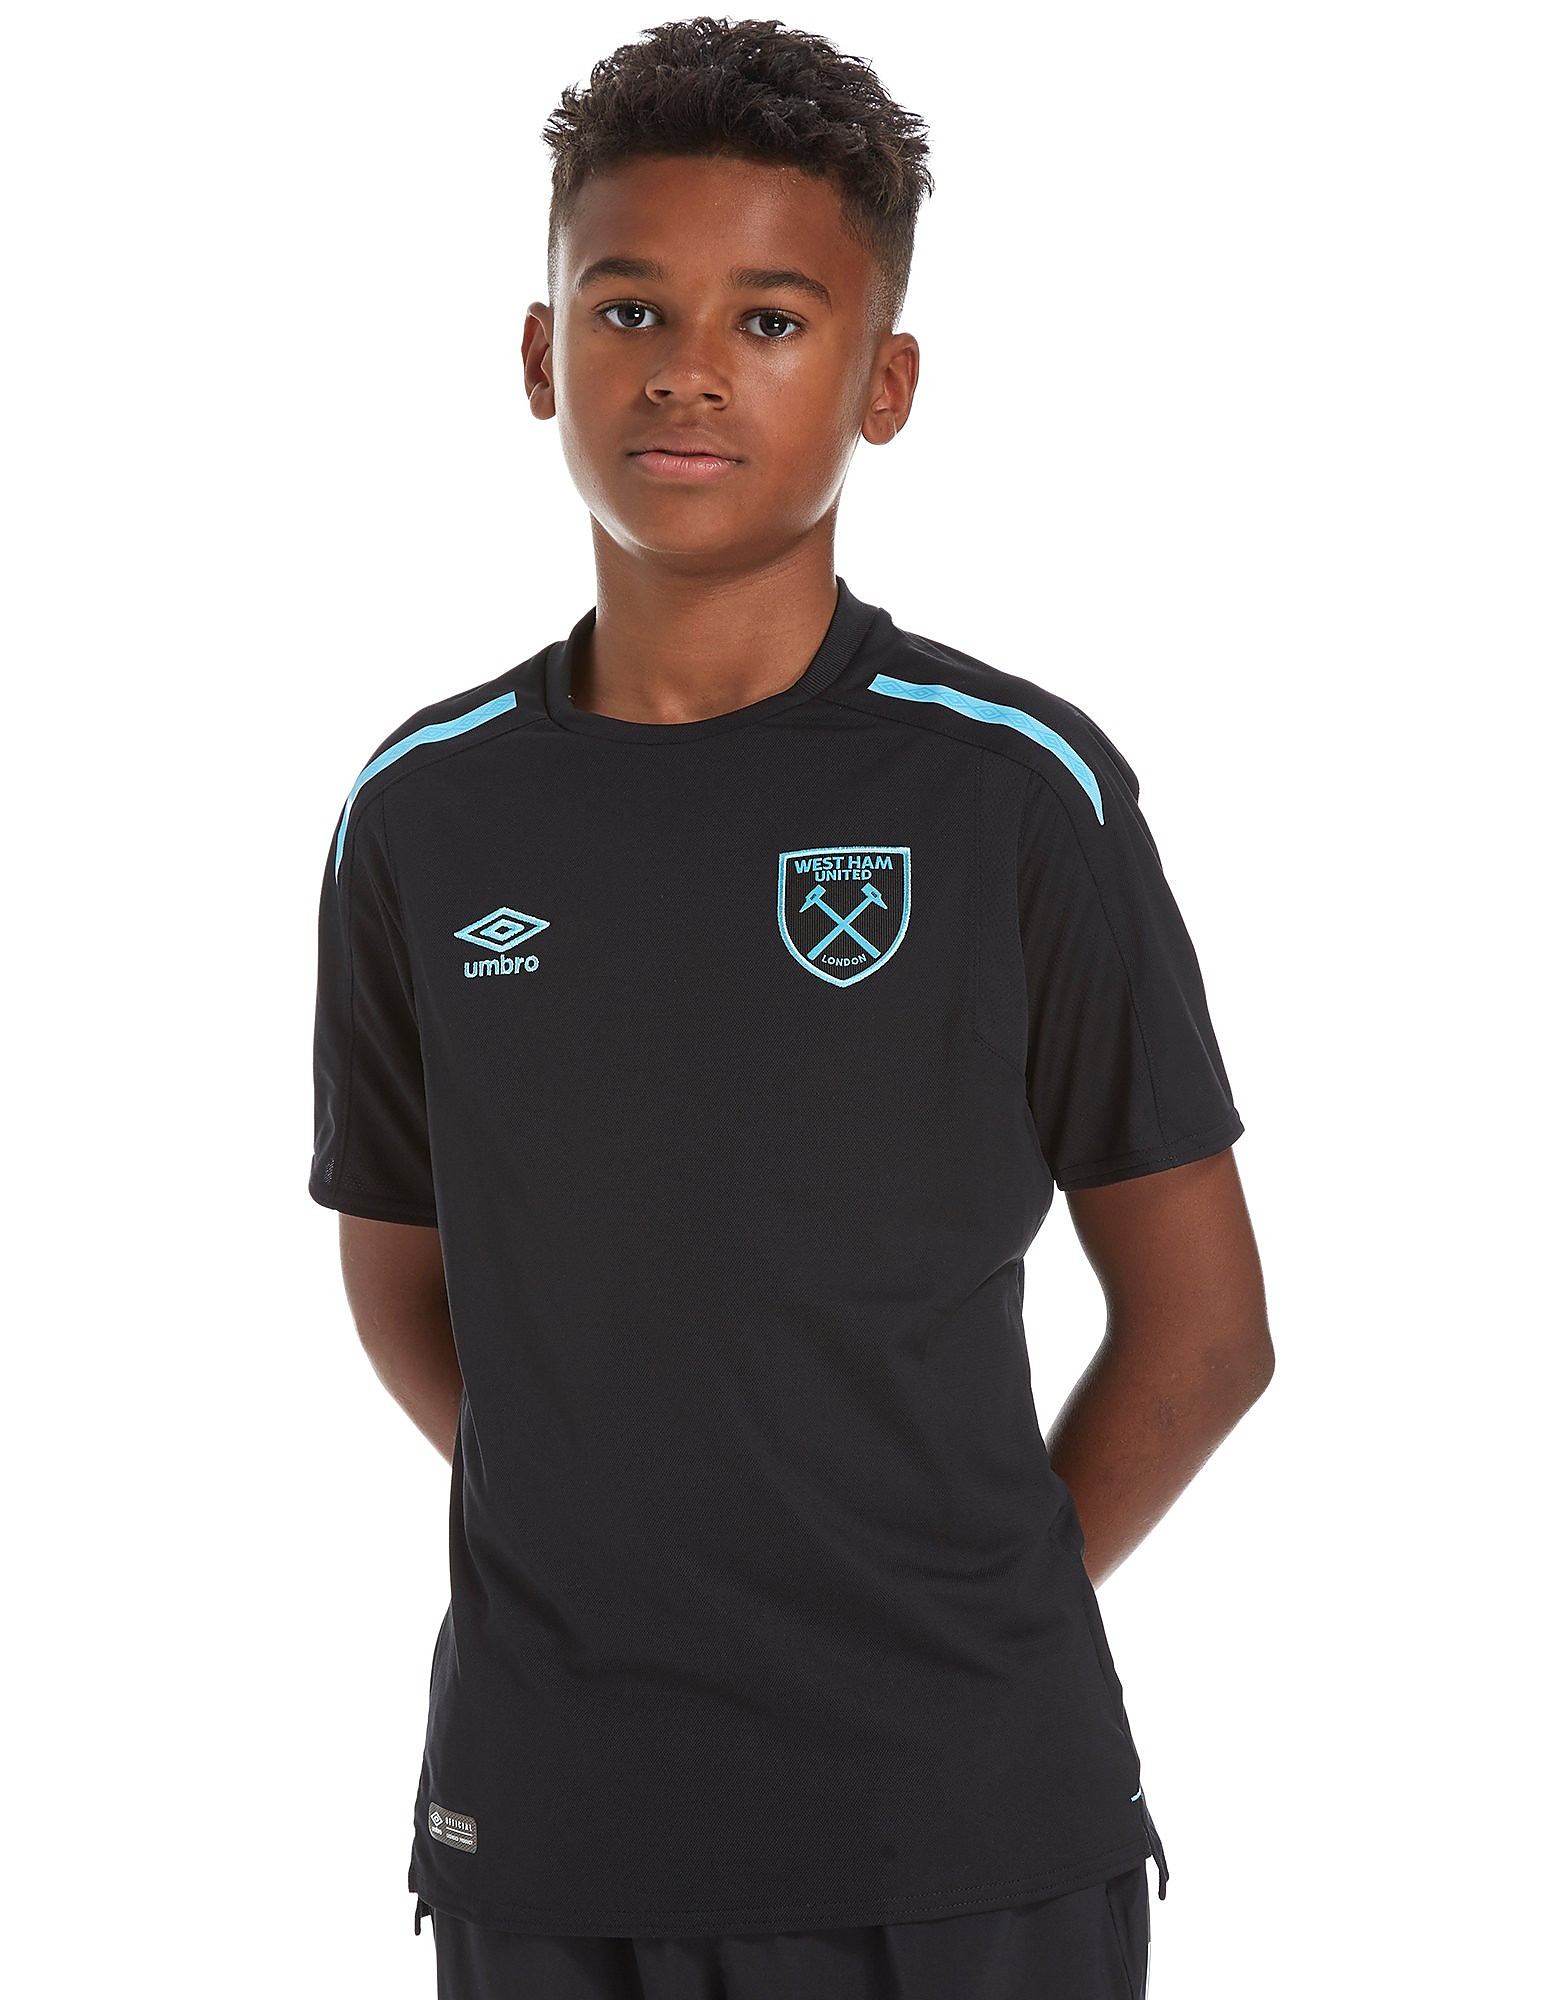 Umbro West Ham Utd 2017/18 Away Shirt Junior